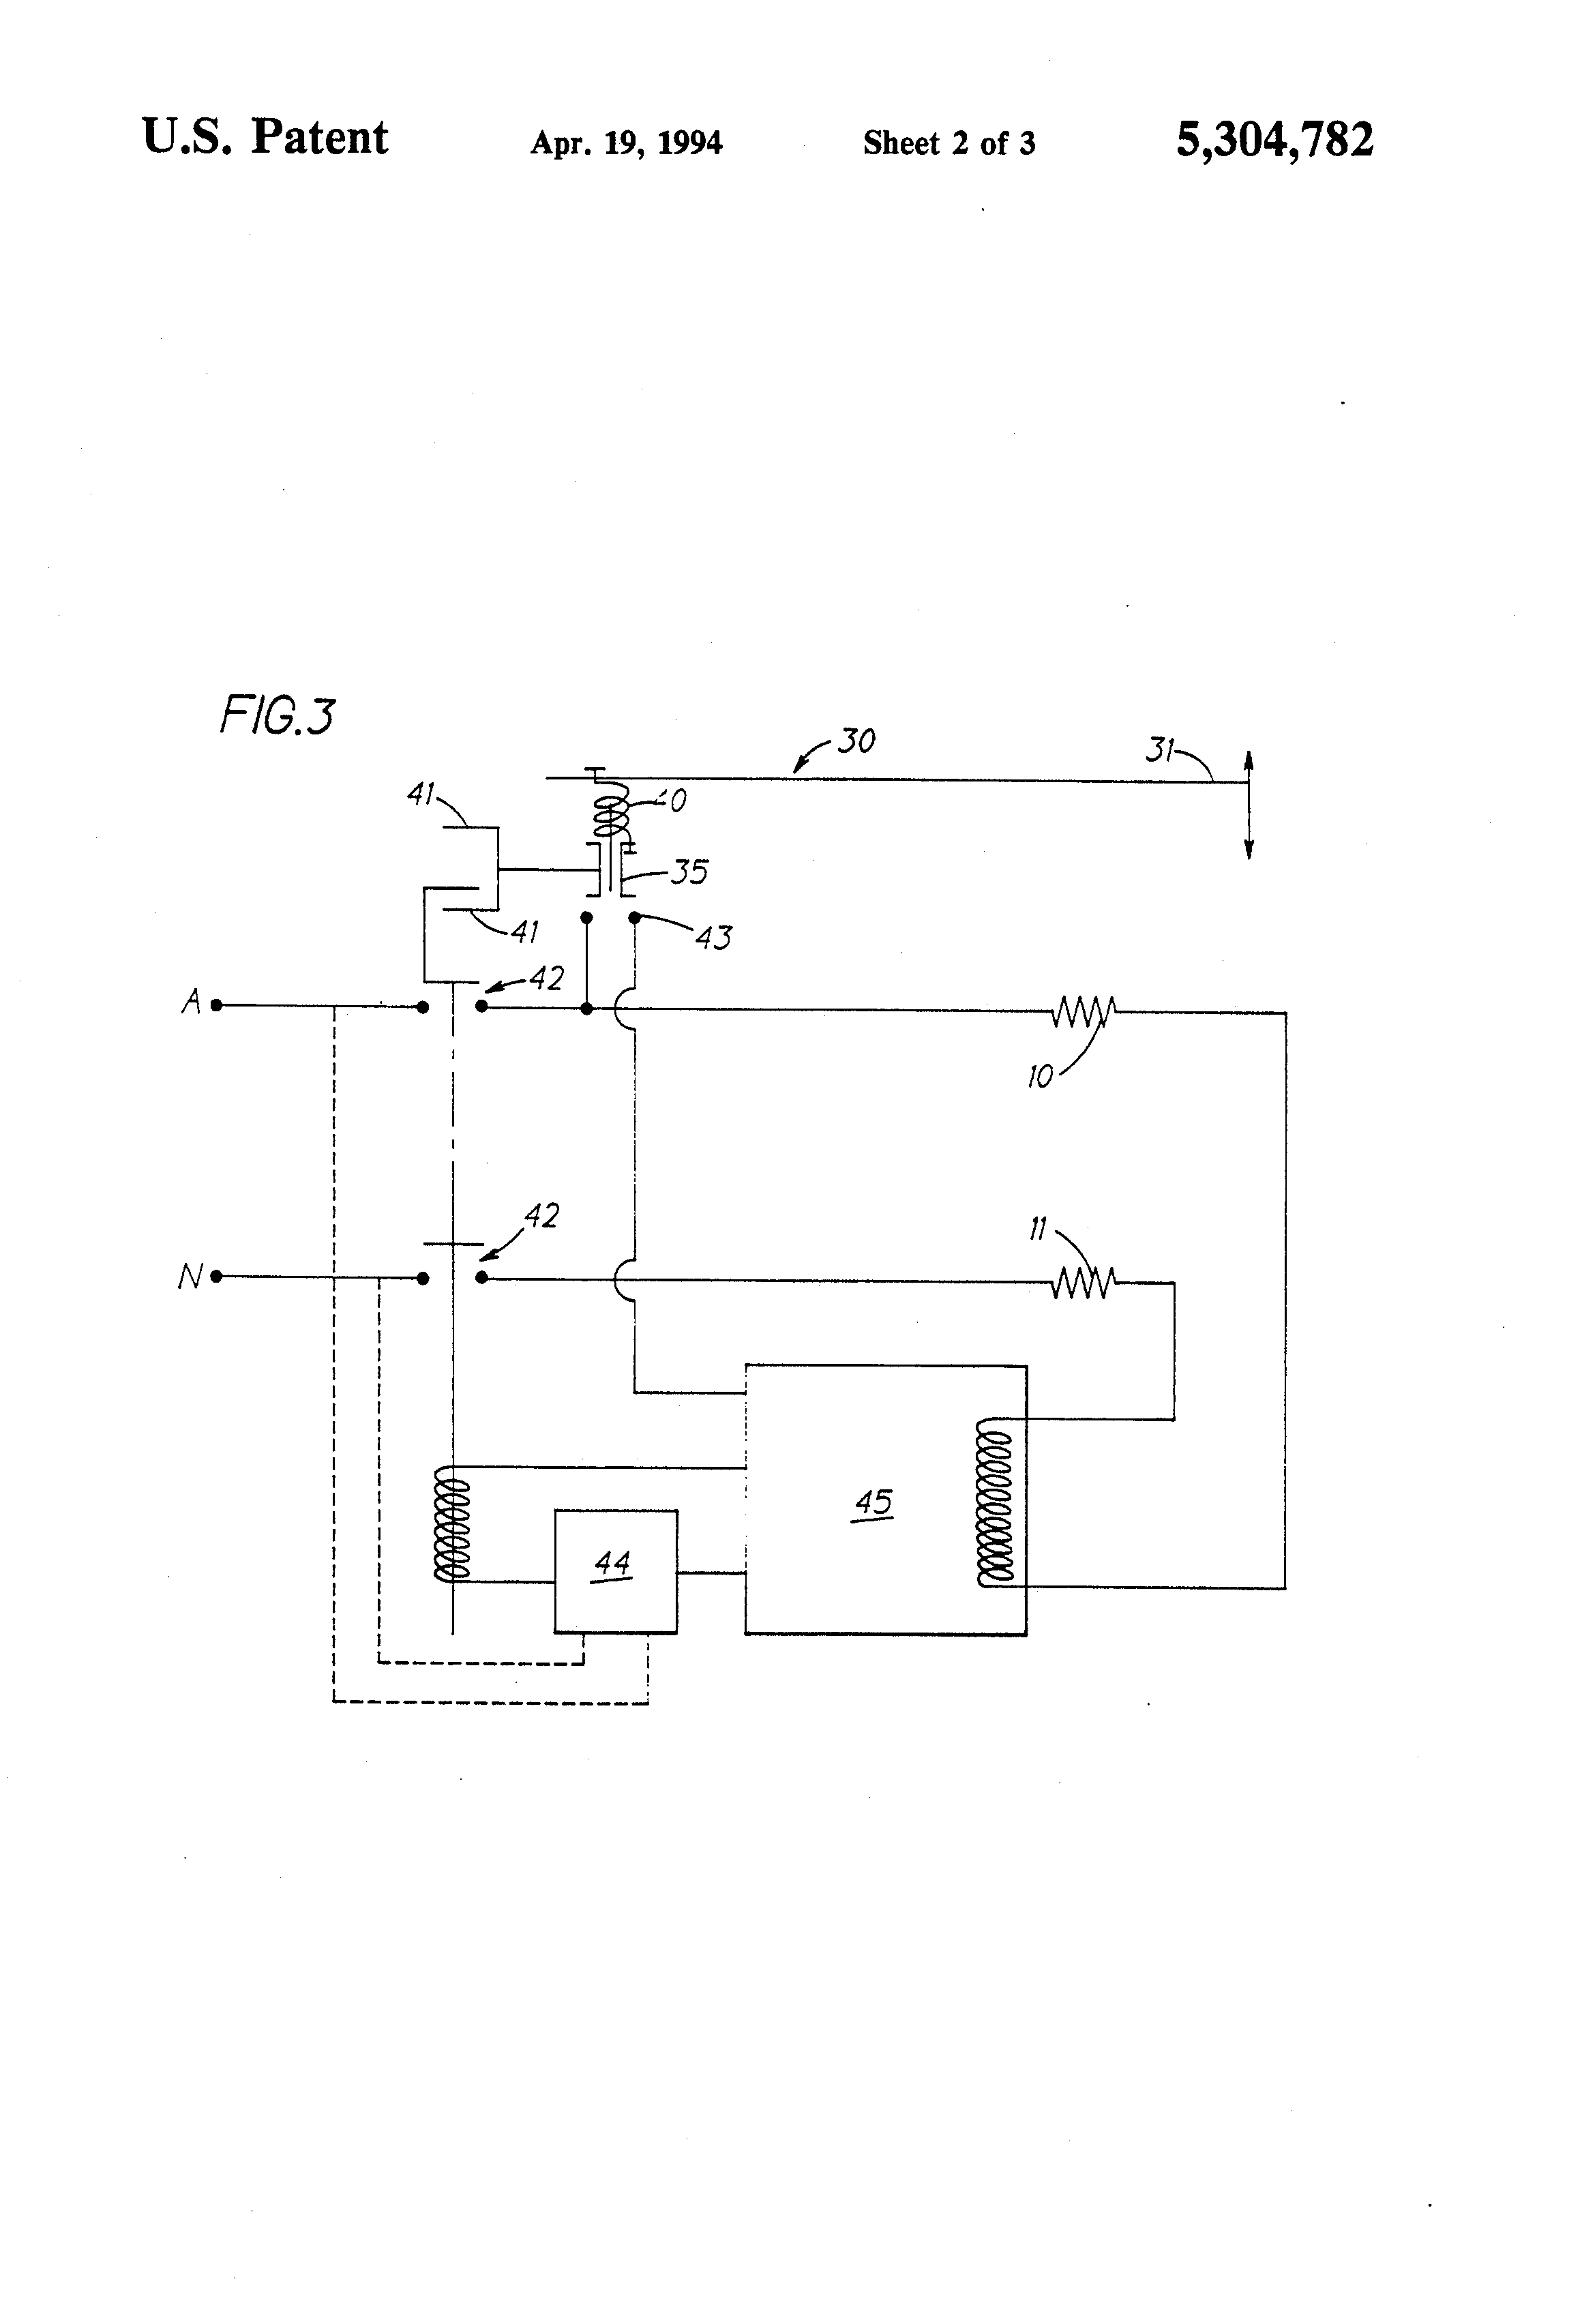 Wiring Diagram Toaster Diagrams Manual Guide U2022 Electrical Stove